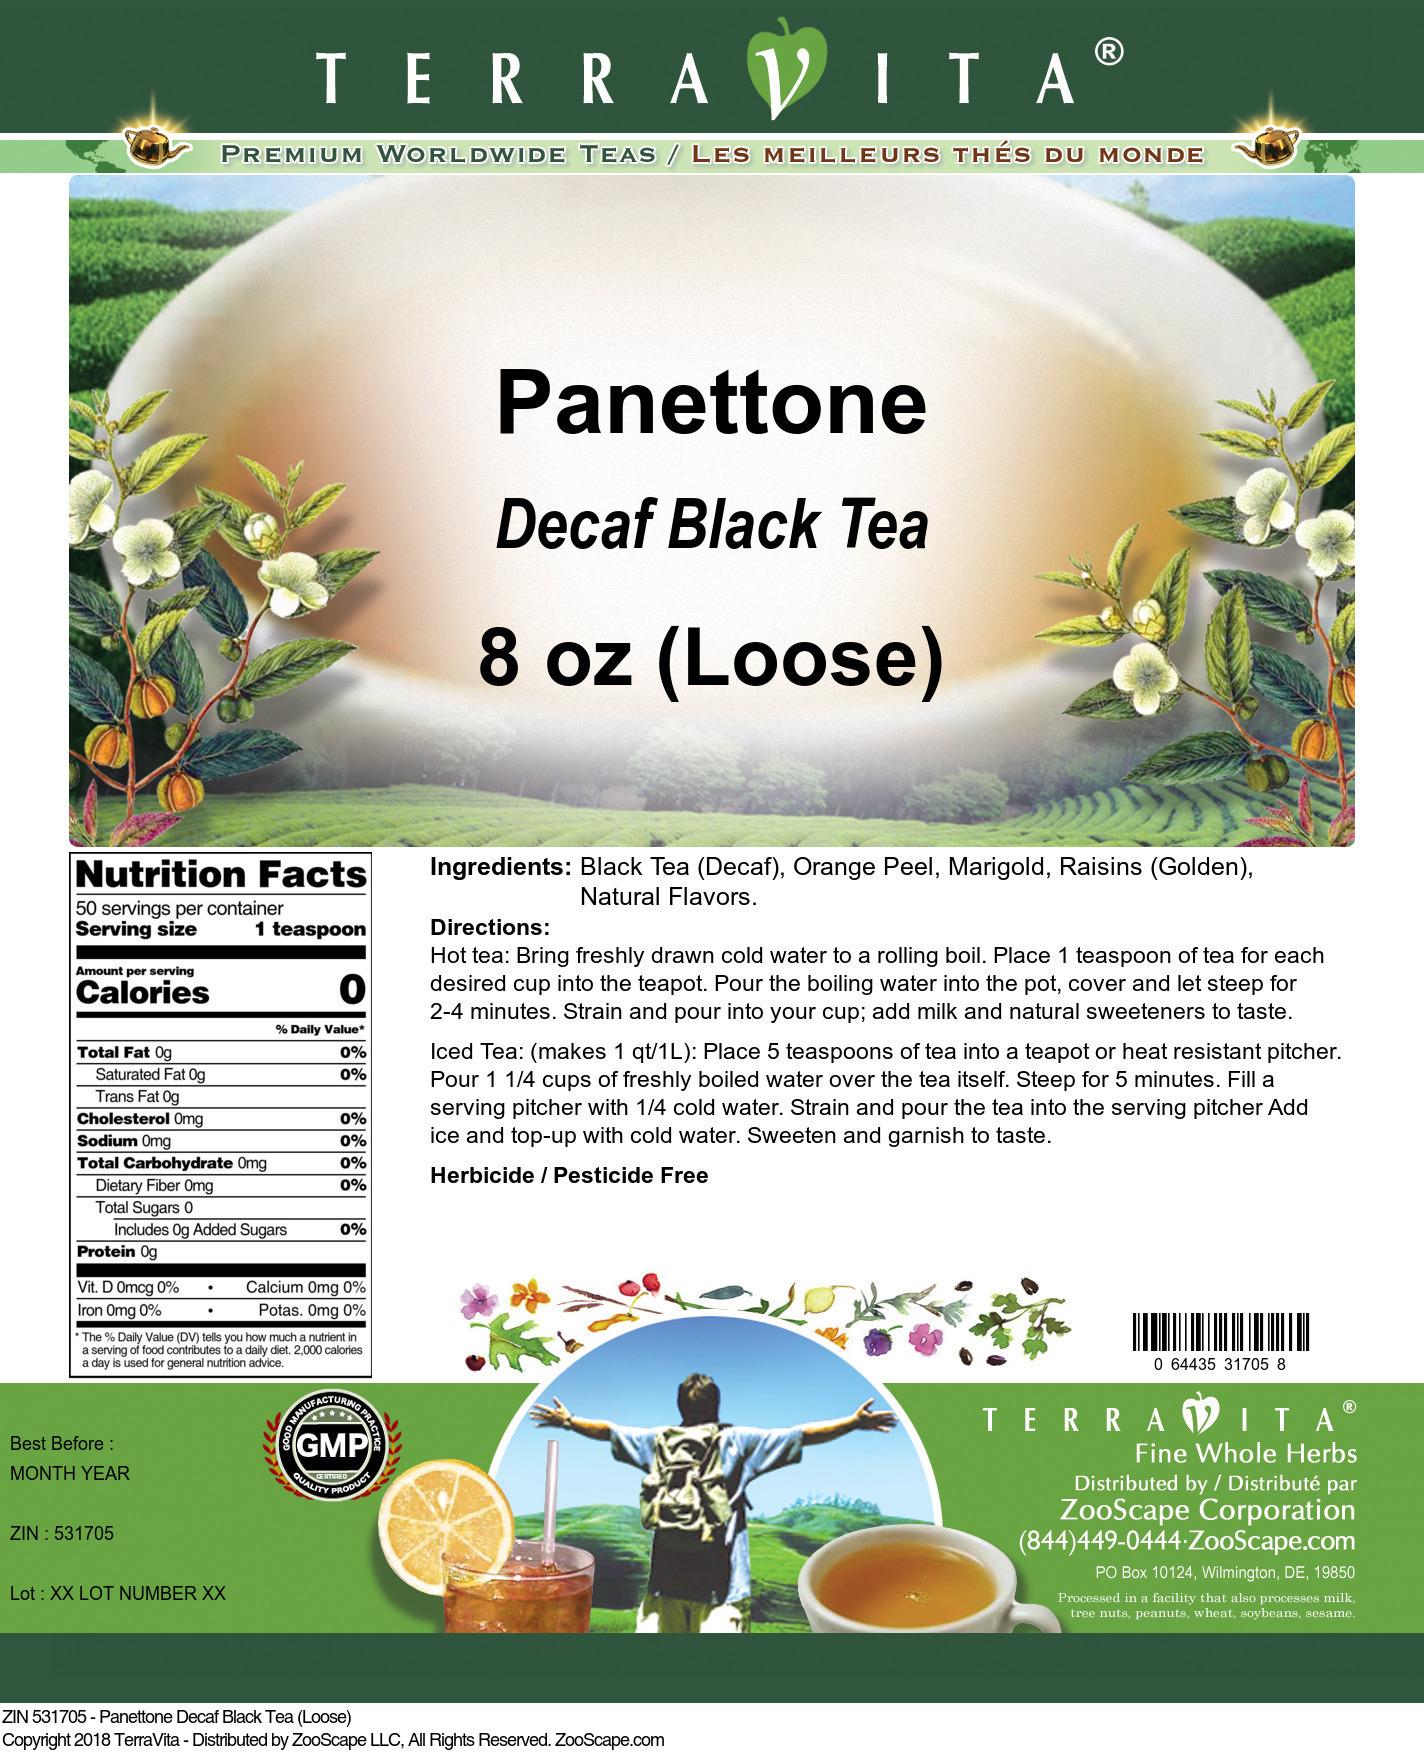 Panettone Decaf Black Tea (Loose)